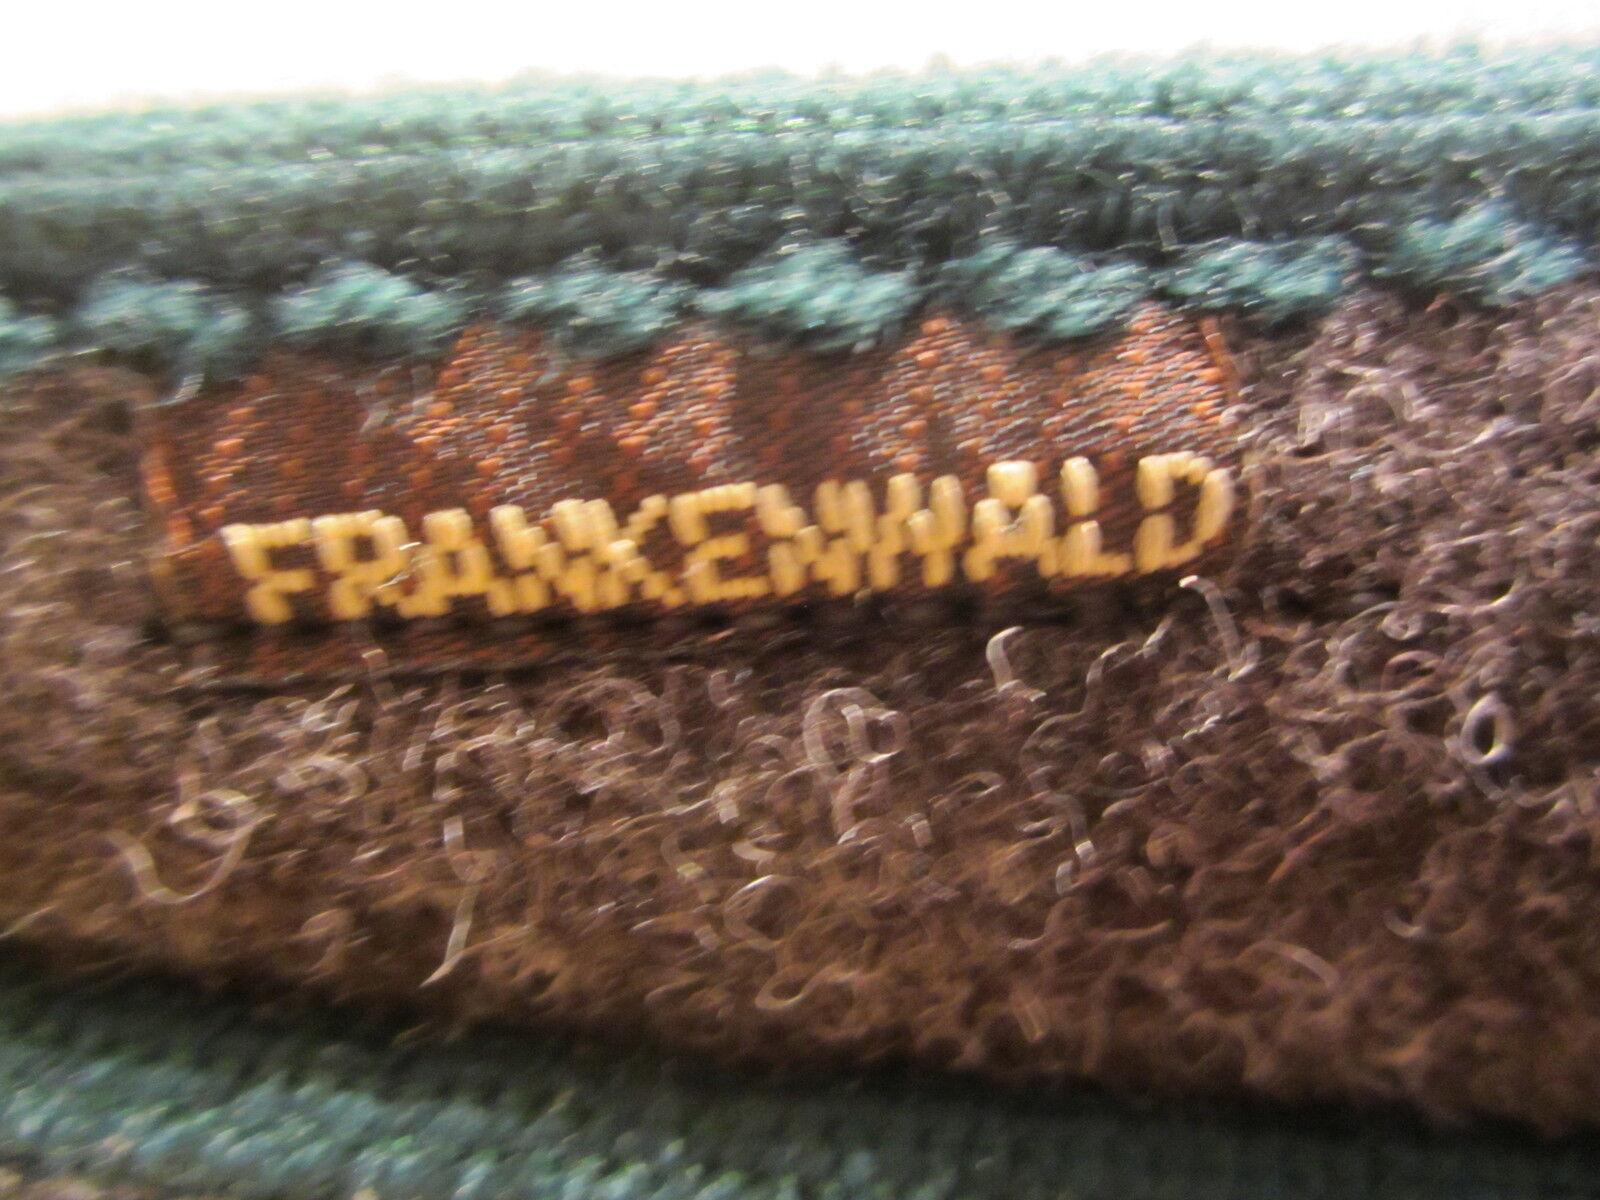 Frankenwald Wollfilzfutter, Herren Pantoffel  Hausschuhe Wollfilzfutter, Frankenwald braun  180 NEU!! 298278